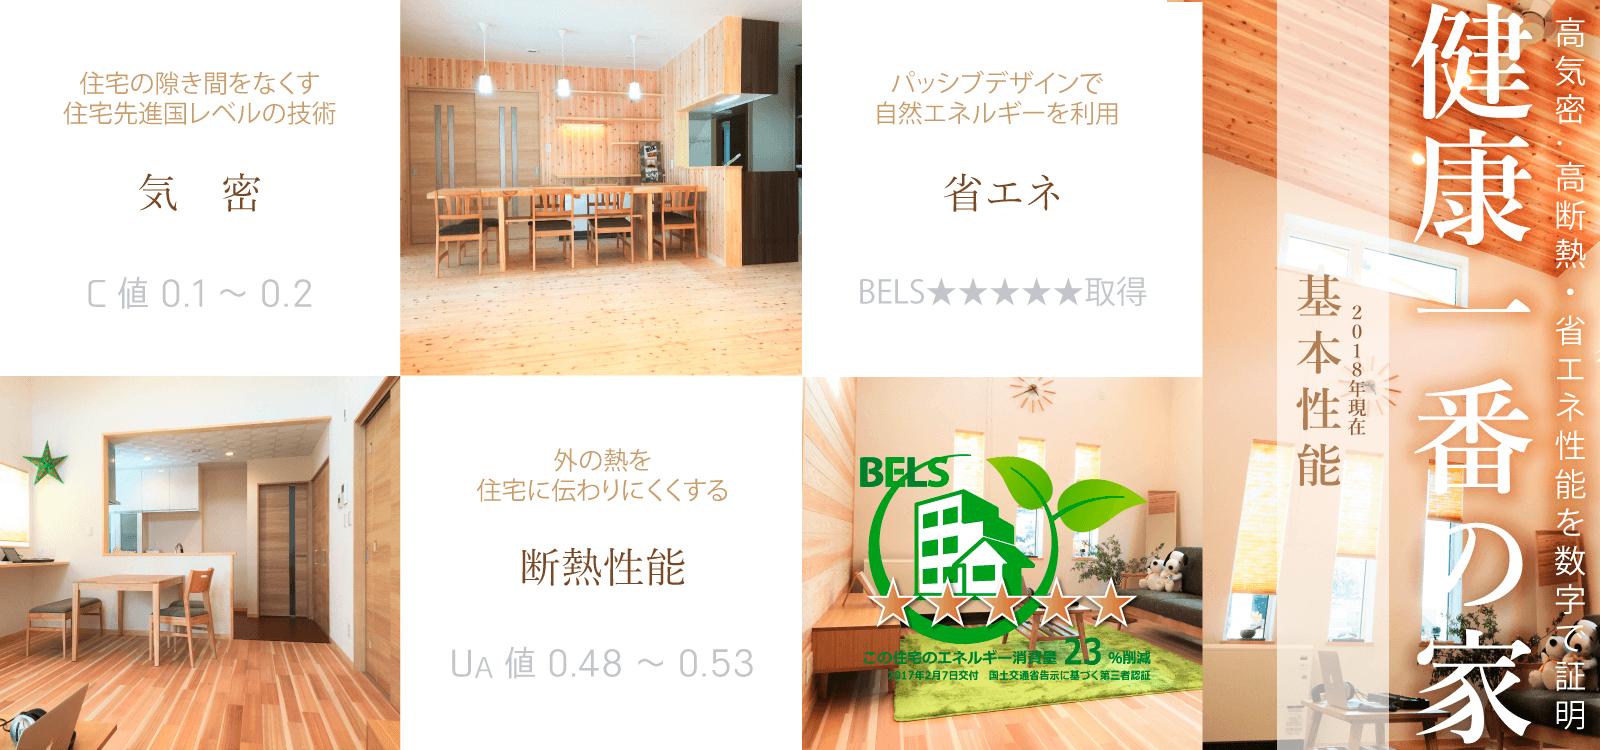 山口県萩市で注文住宅、健康住宅の新築は一乗建設